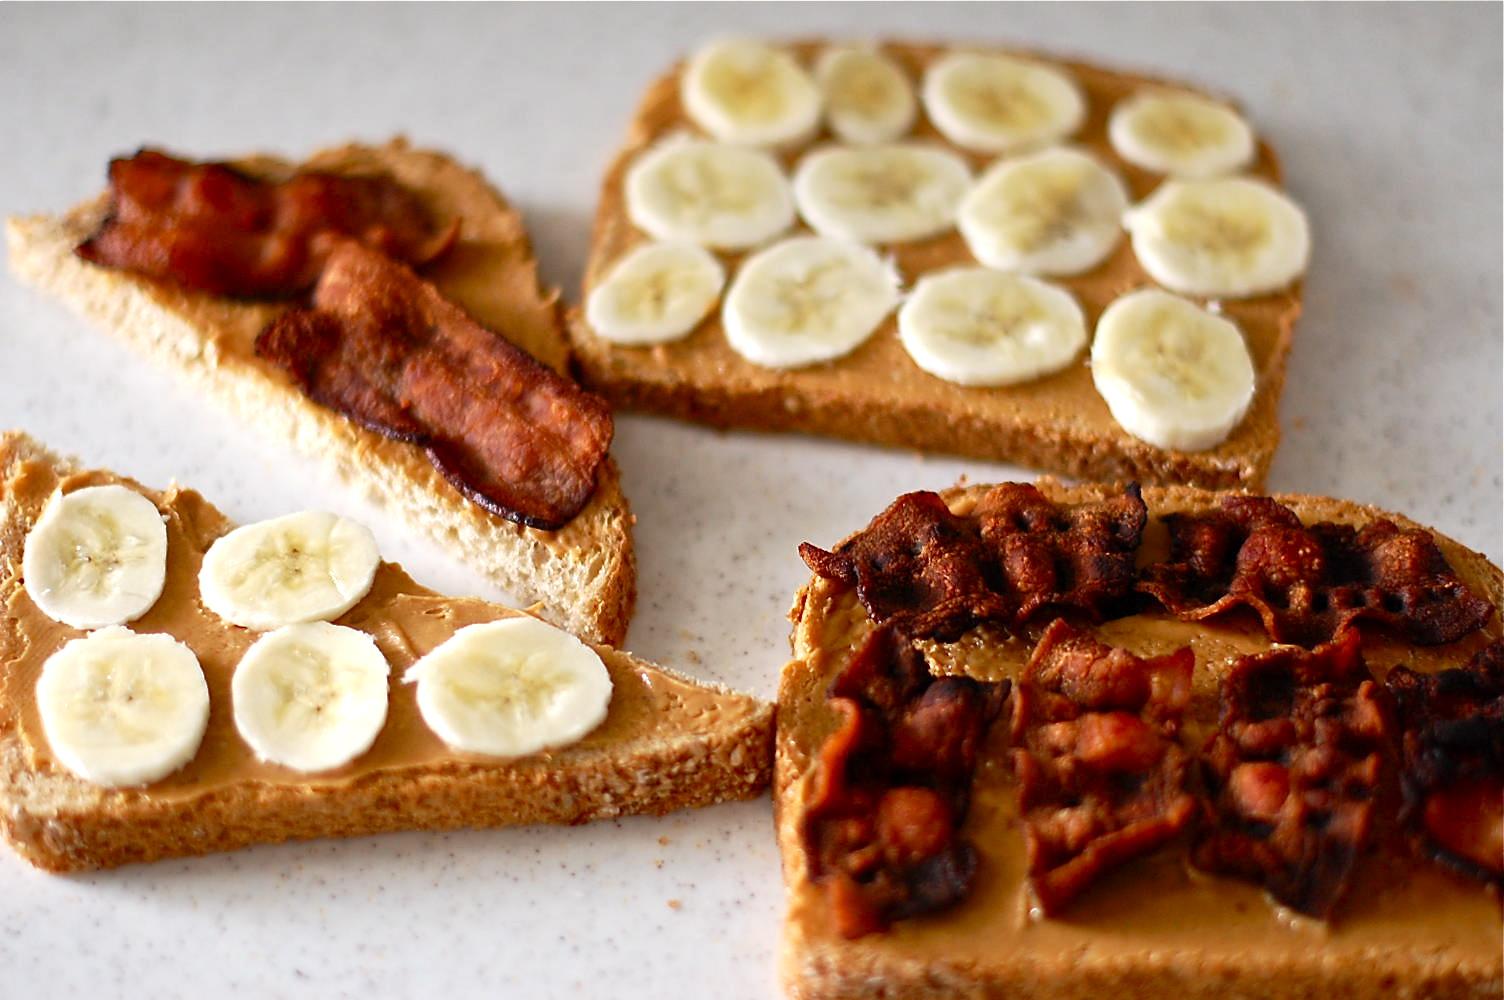 ... Banana, and Bacon Sandwich AKA The INFAMOUS Elvis Sandwich? — The